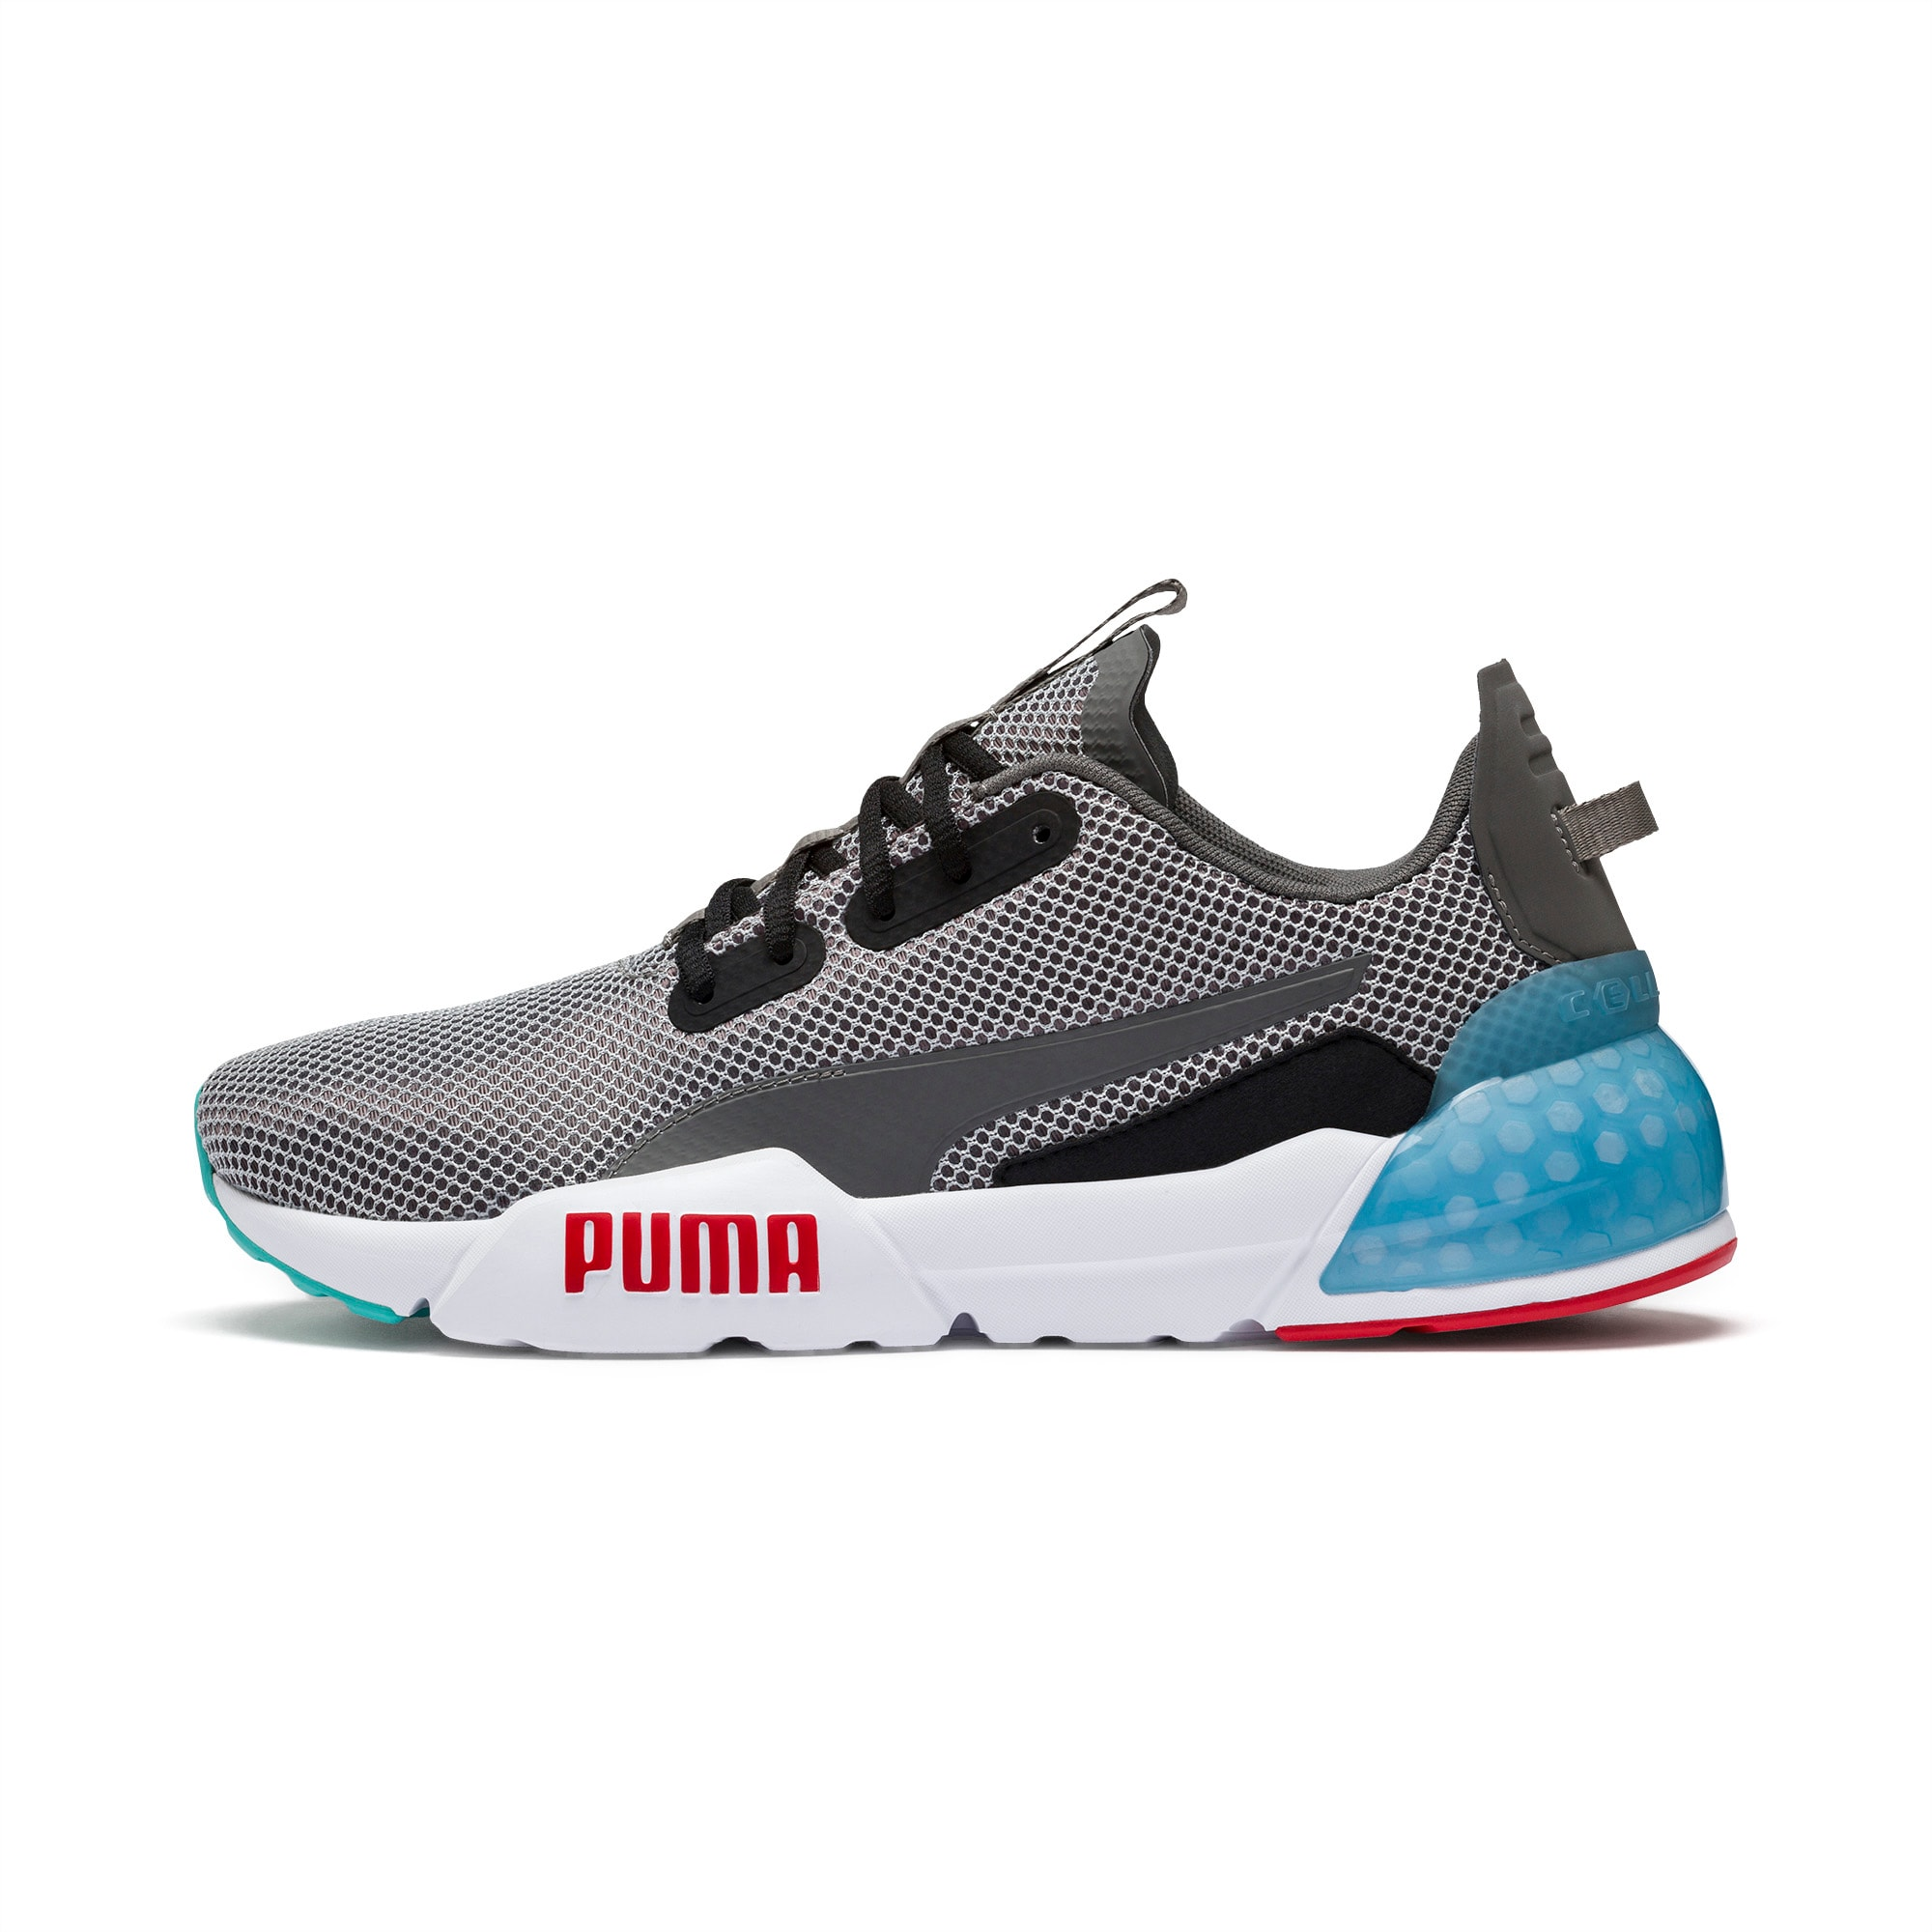 2zapatos running puma